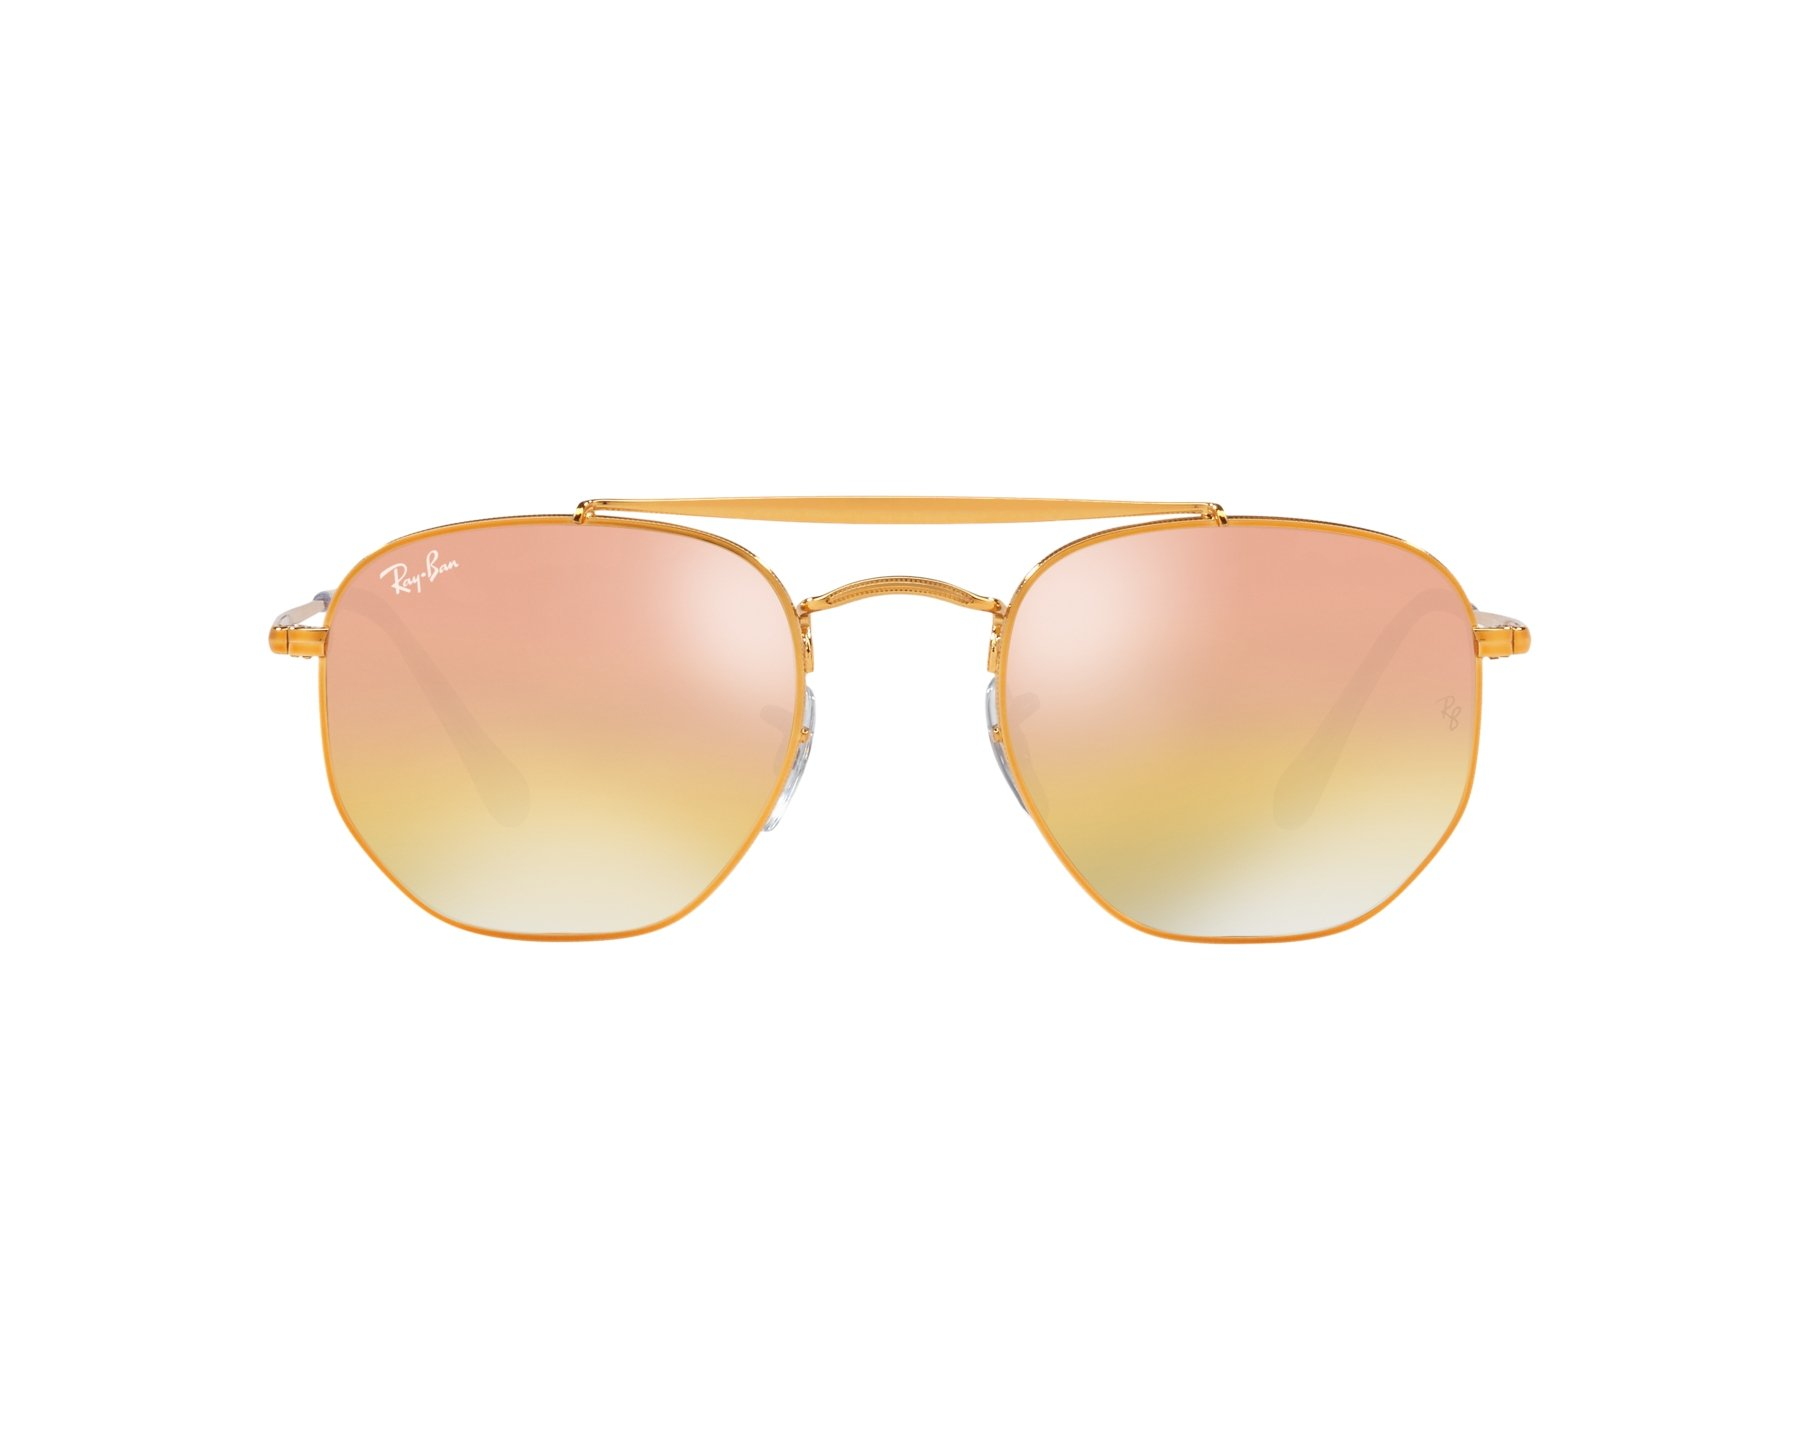 Ray-Ban Sonnenbrille RB-3648 9001l1 gold - Gläser: grau-braun - Visionet